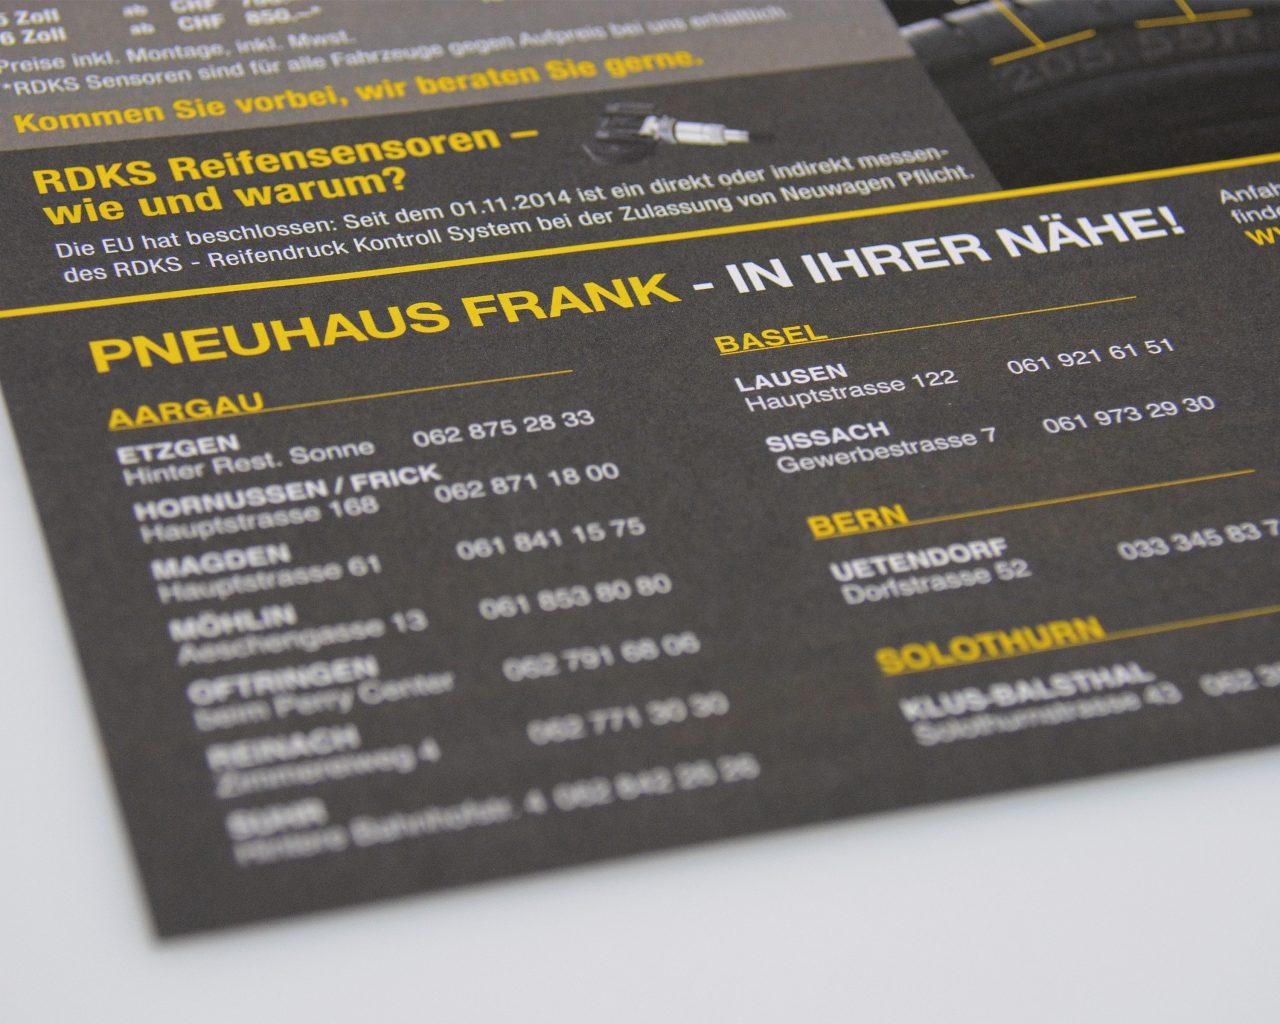 pneuhausfrank-04